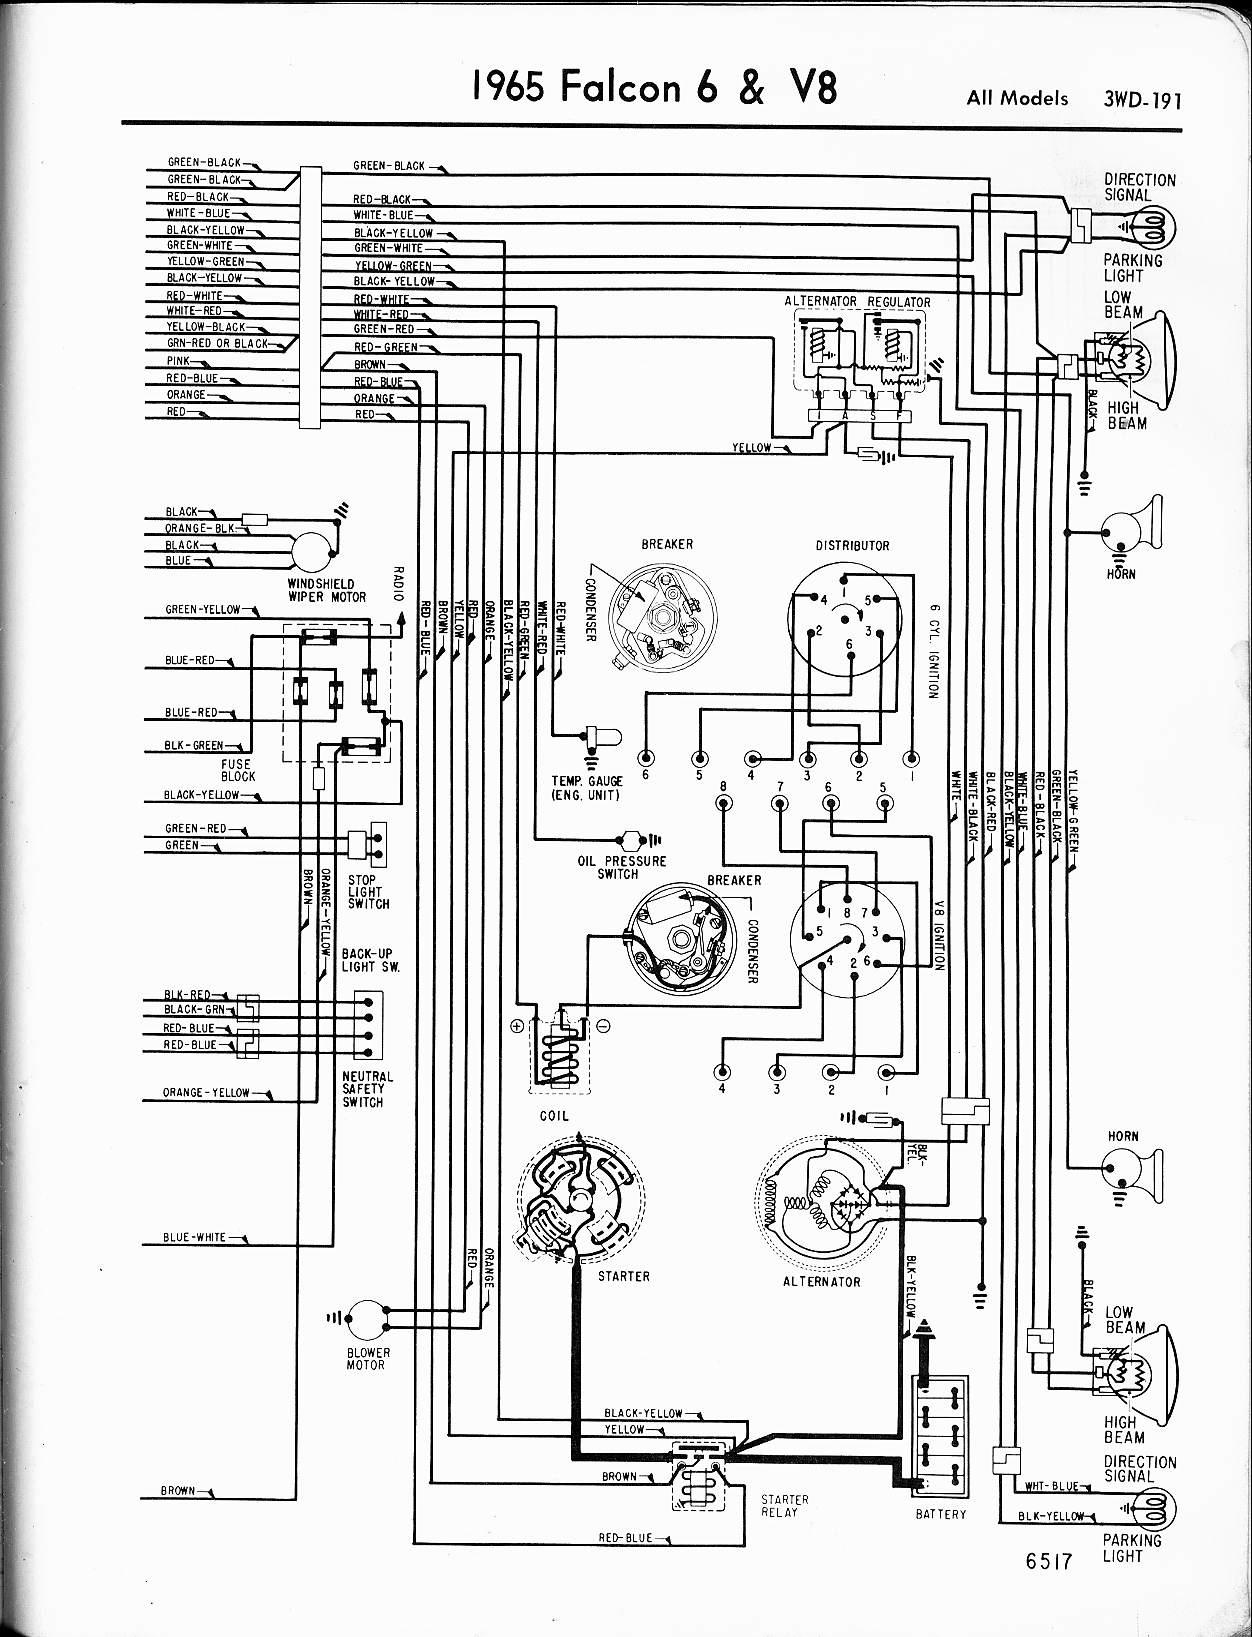 1962 ford falcon wiring diagram 65 galaxie wiring diagram e3 wiring diagram  65 galaxie wiring diagram e3 wiring